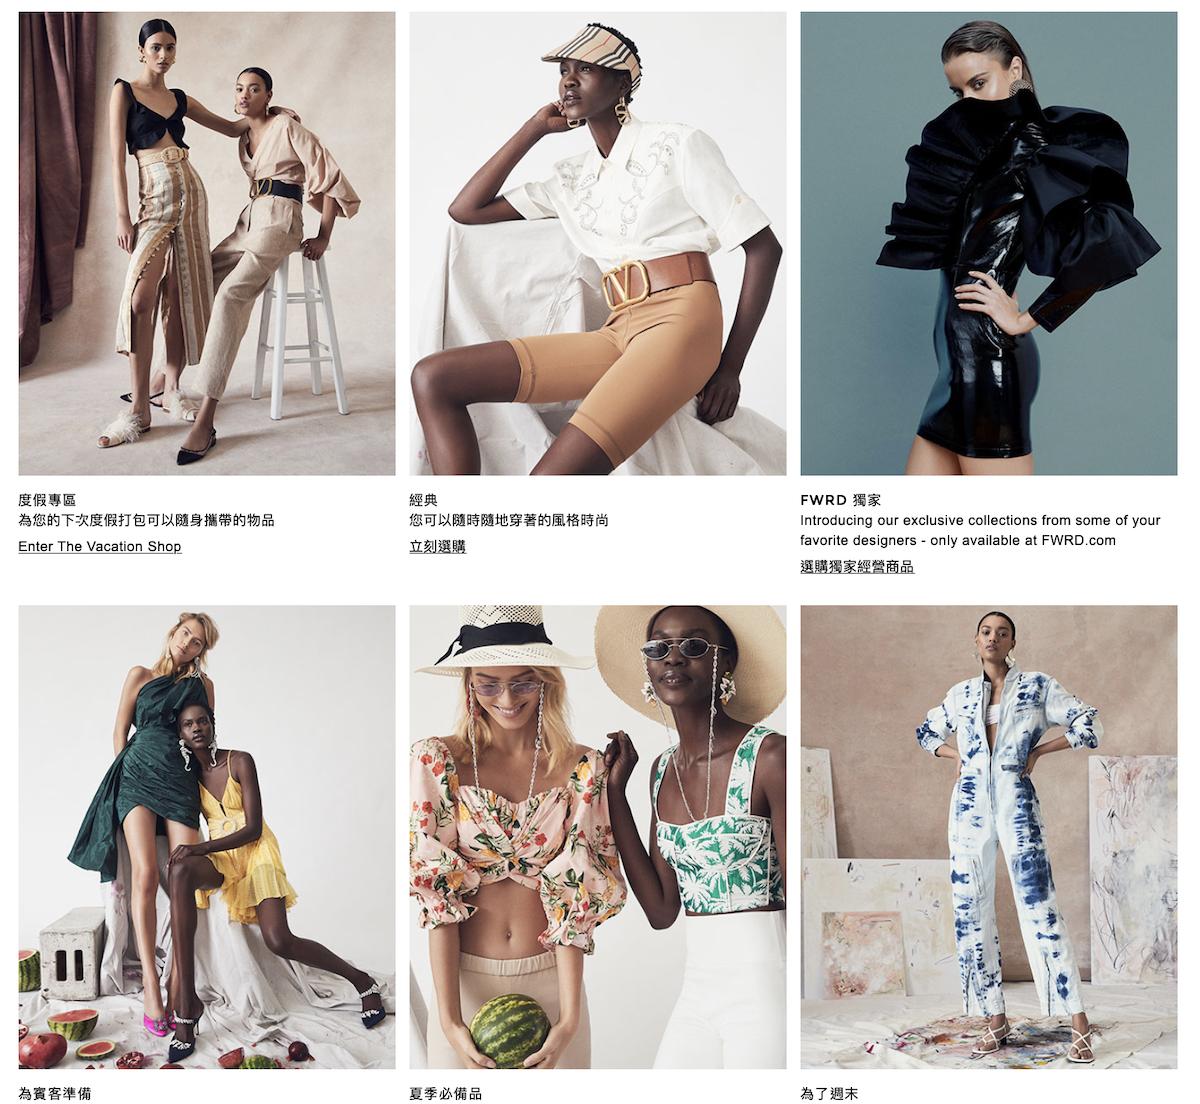 forward-code-discount-Acne Studios-Alexander Wang-Mansur Gavriel-Givenchy-折扣碼-網購-特價-優惠-便宜-美妝-保養品-時尚-歐美彩妝-Mac-免運費-運費-尺寸-洋裝-包包-關稅-評價-介紹-ptt